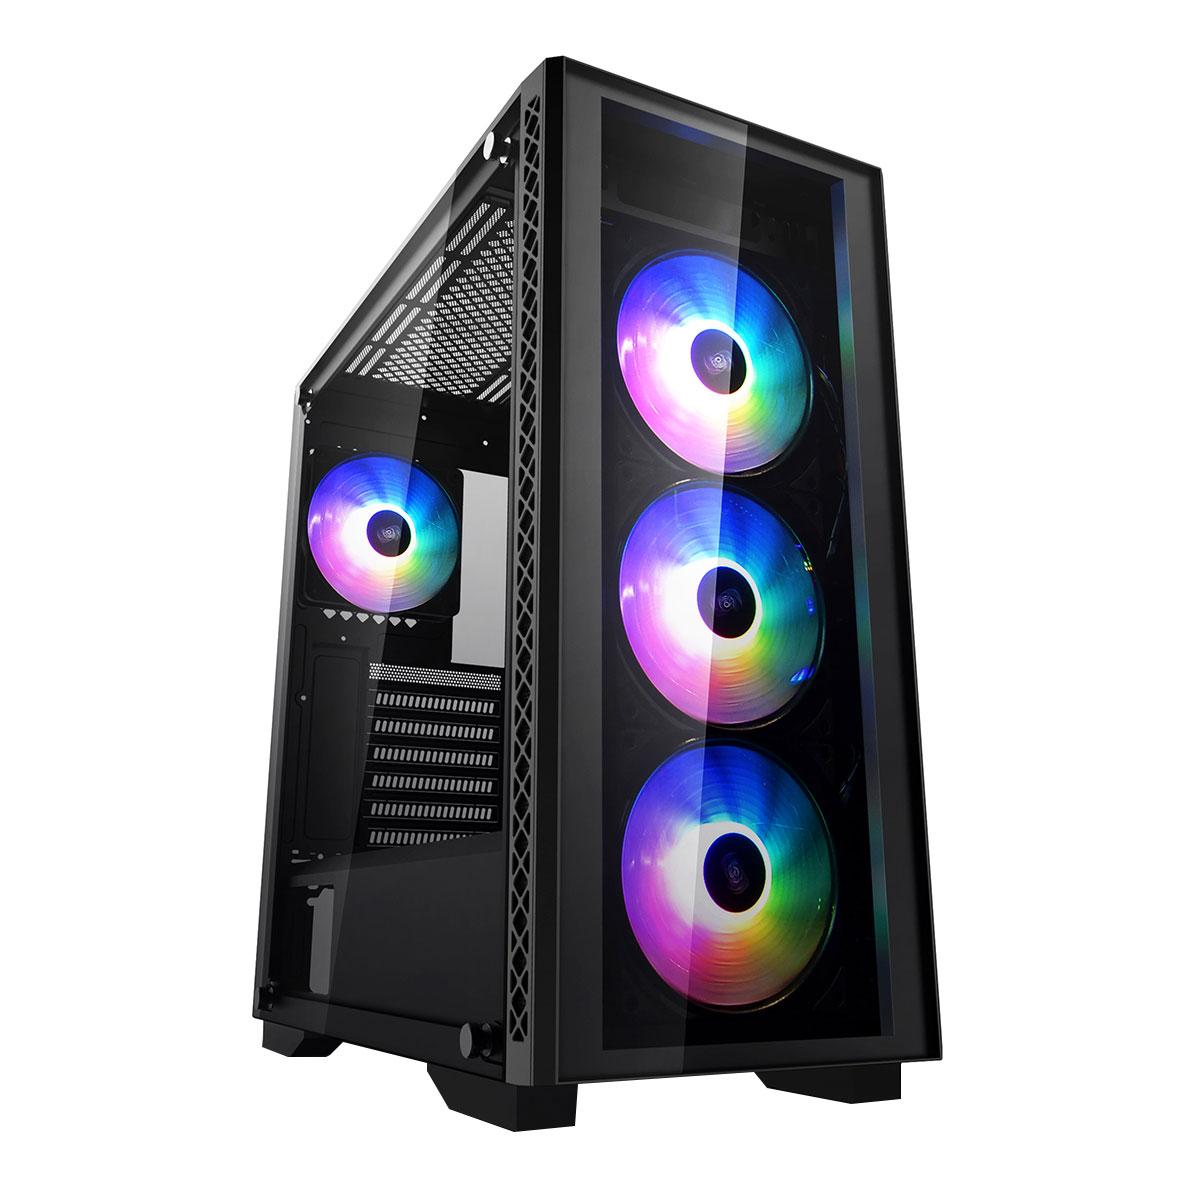 کیس کامپیوتر دیپ کول مدل MATREXX 50 ADD-RGB 4F